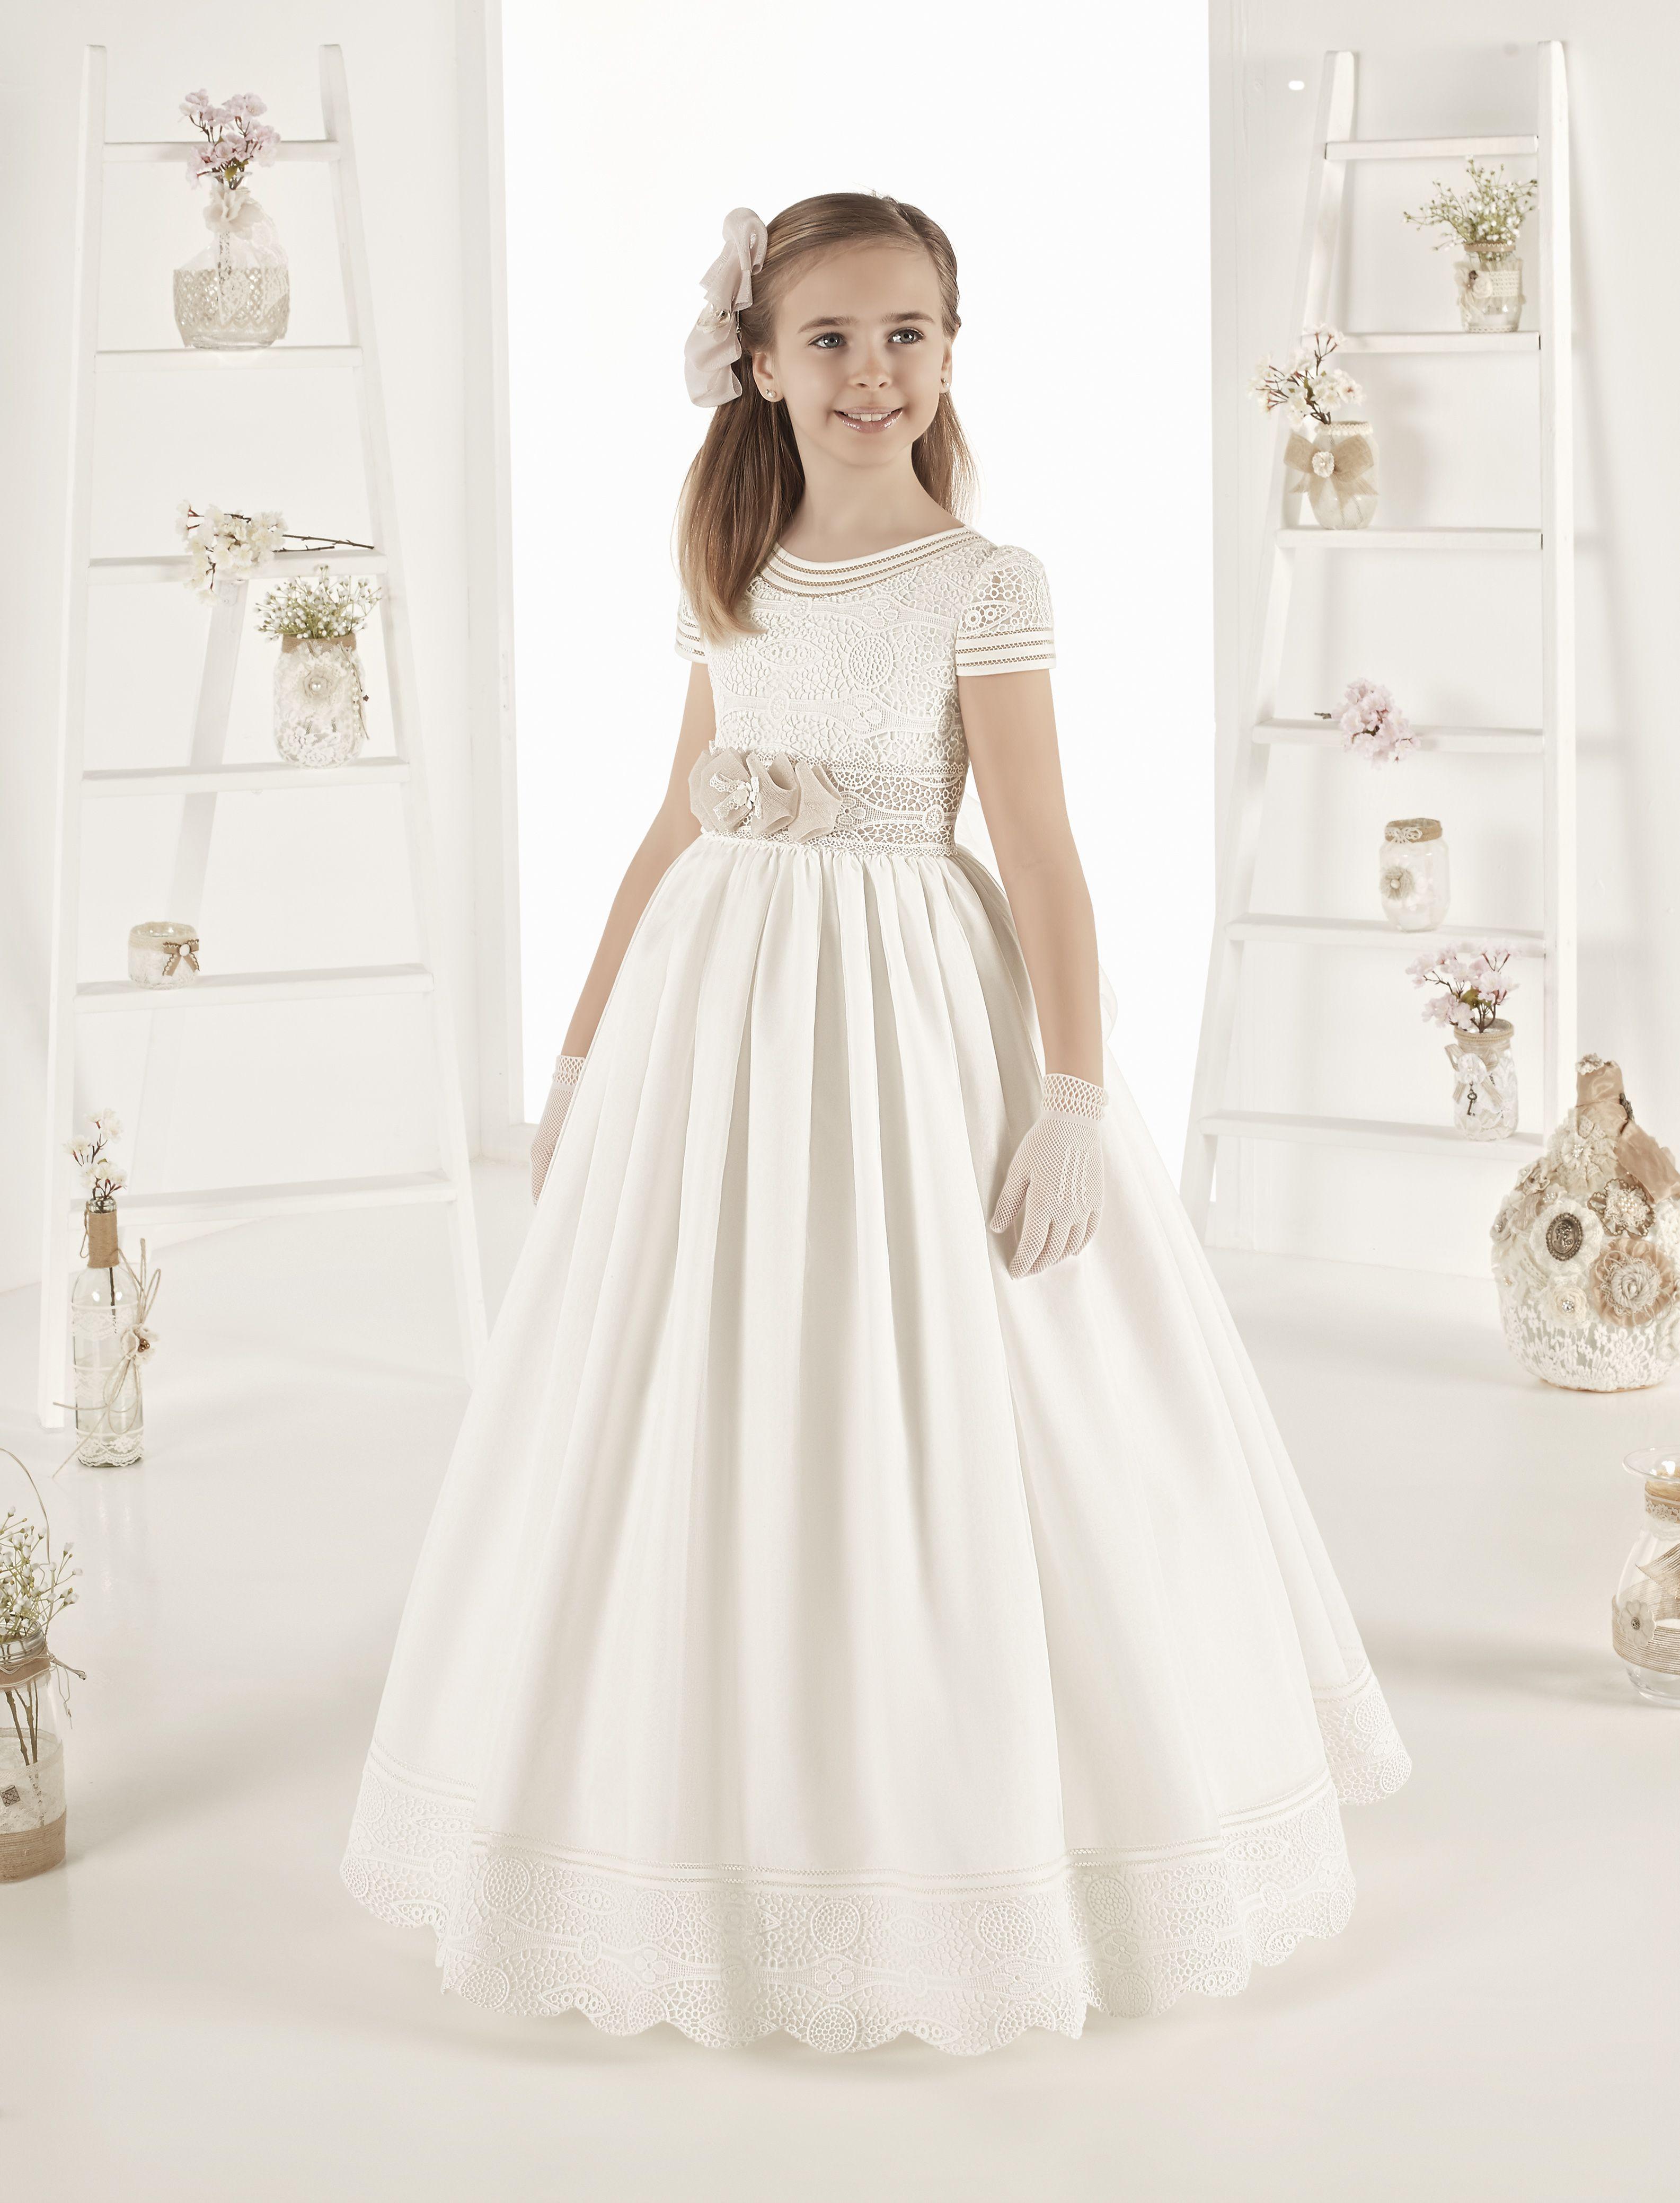 Spanish Communion Dresses Rosa Clara 2019 Style 30134 Communion Dresses Dresses Wedding Dresses